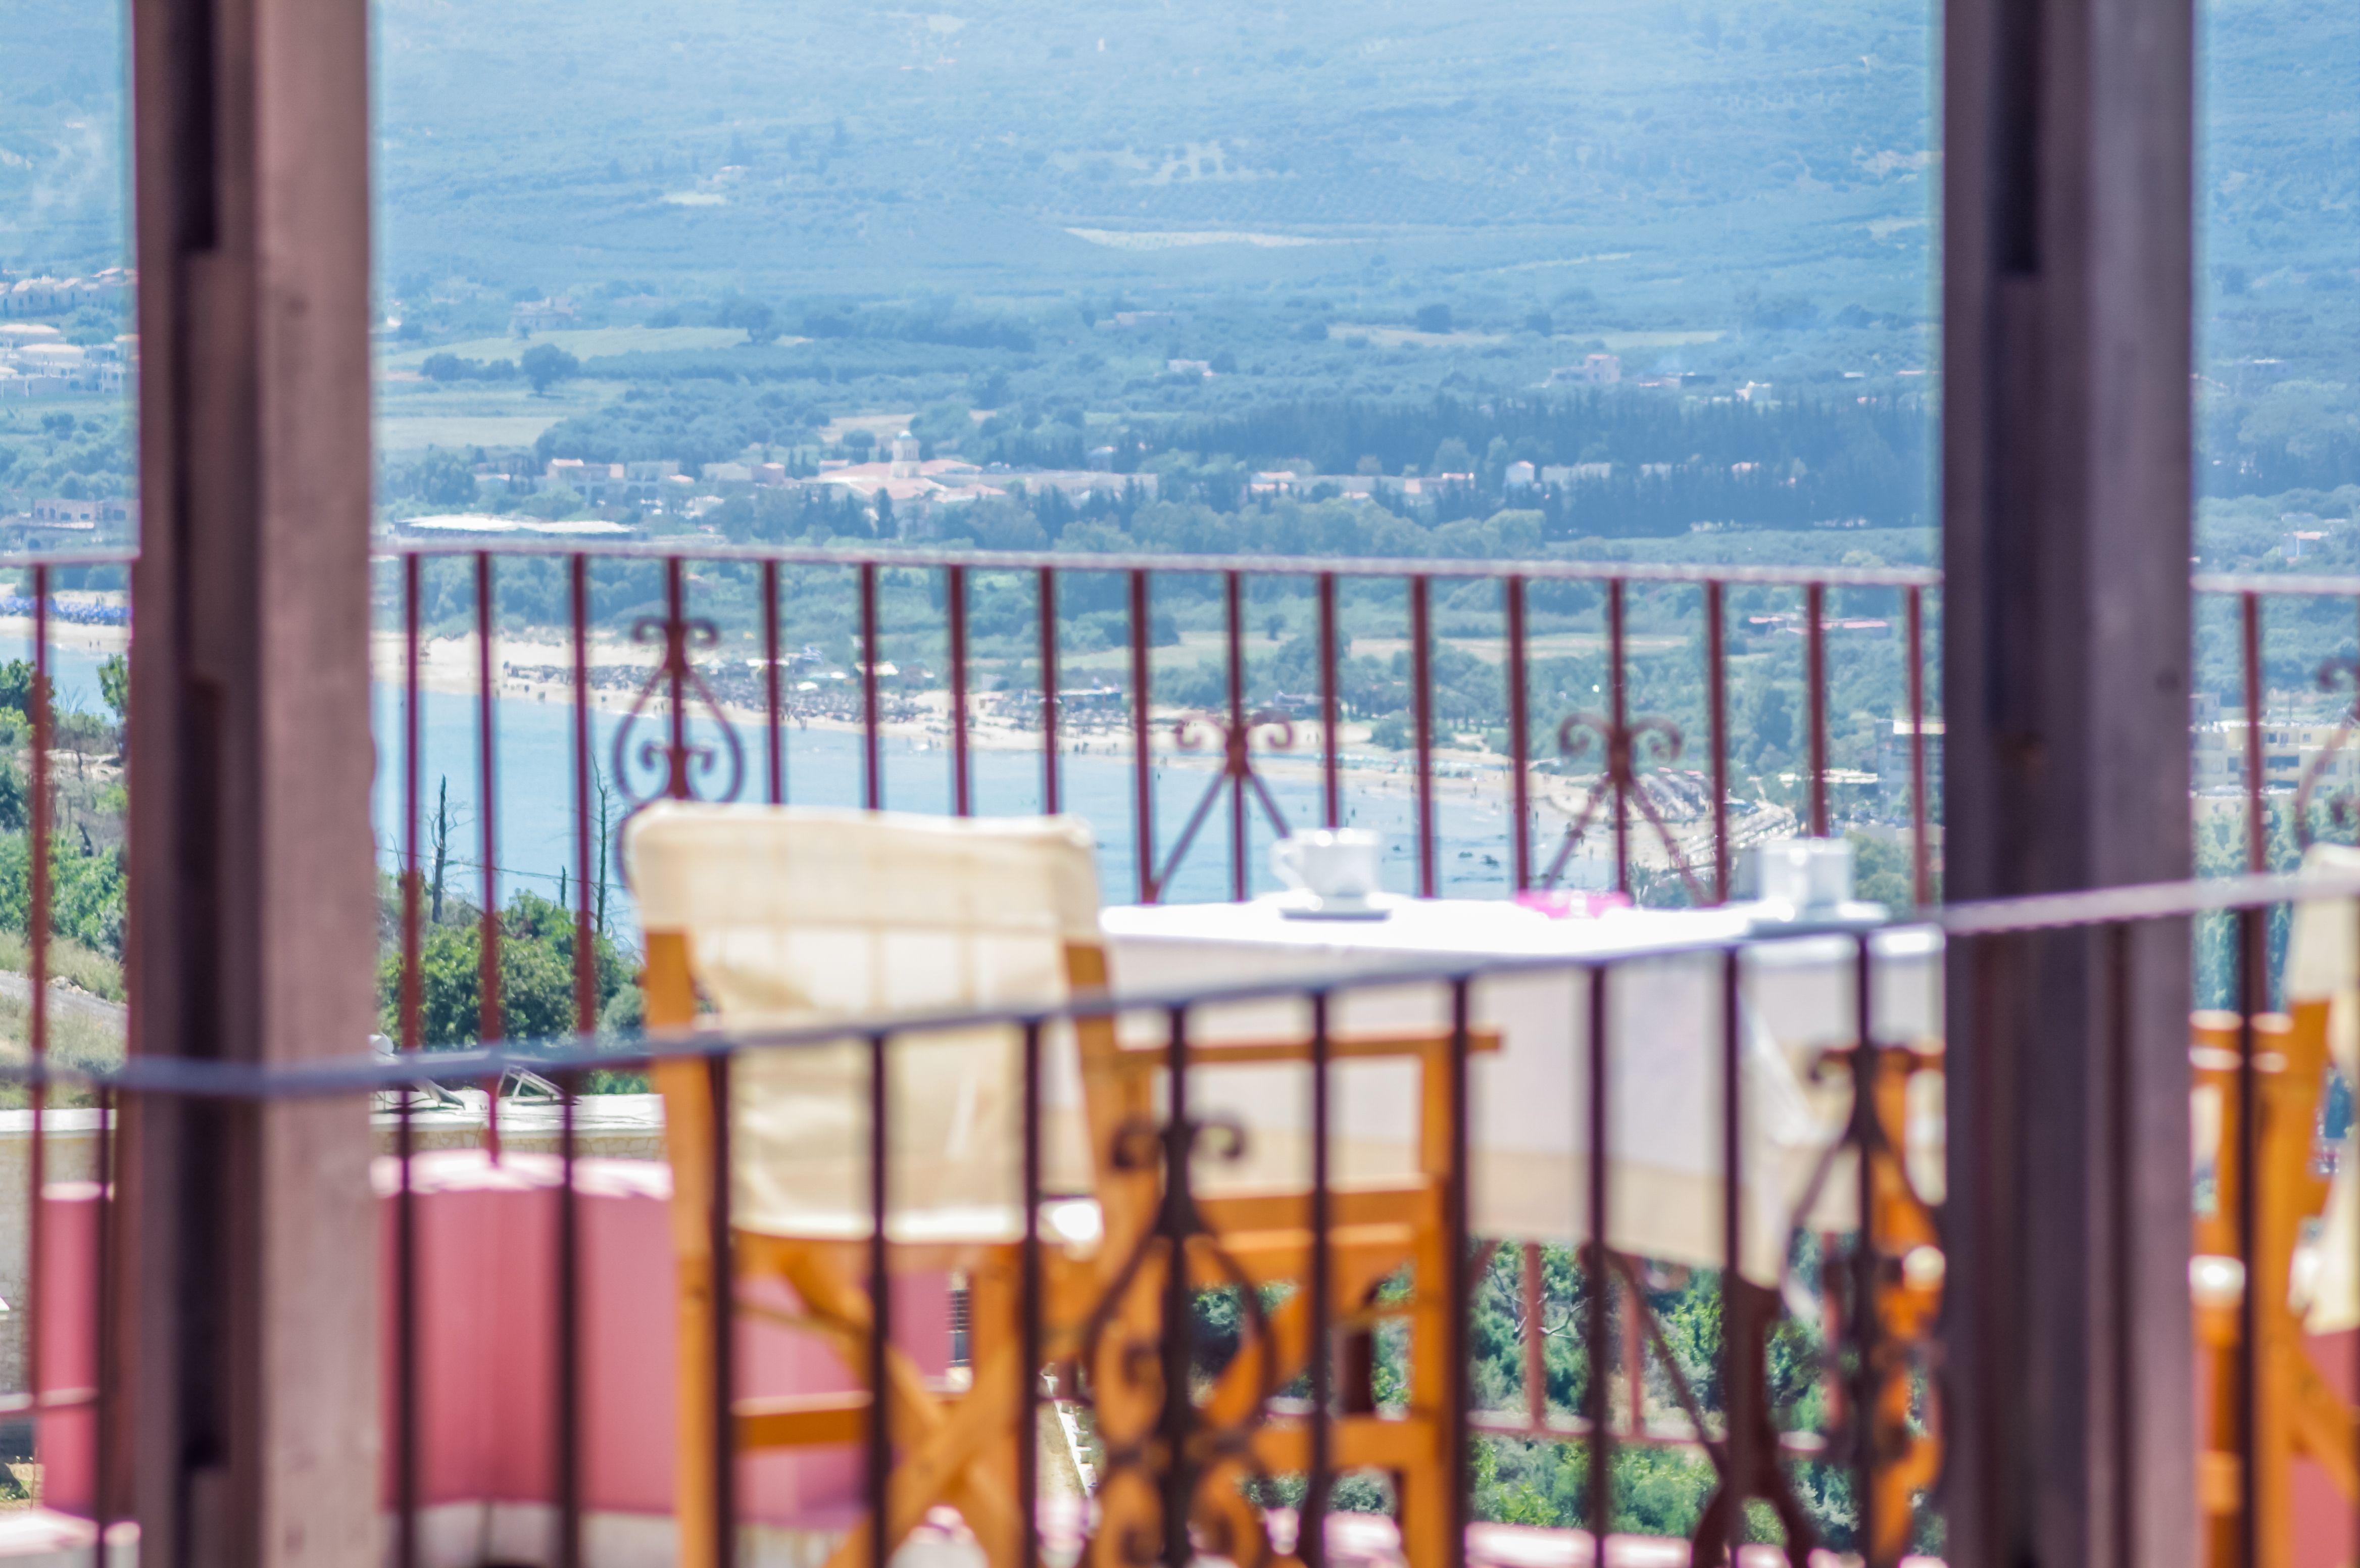 Astrostudio Apartments in Exopolis near Georgioupolis Chania - Crete